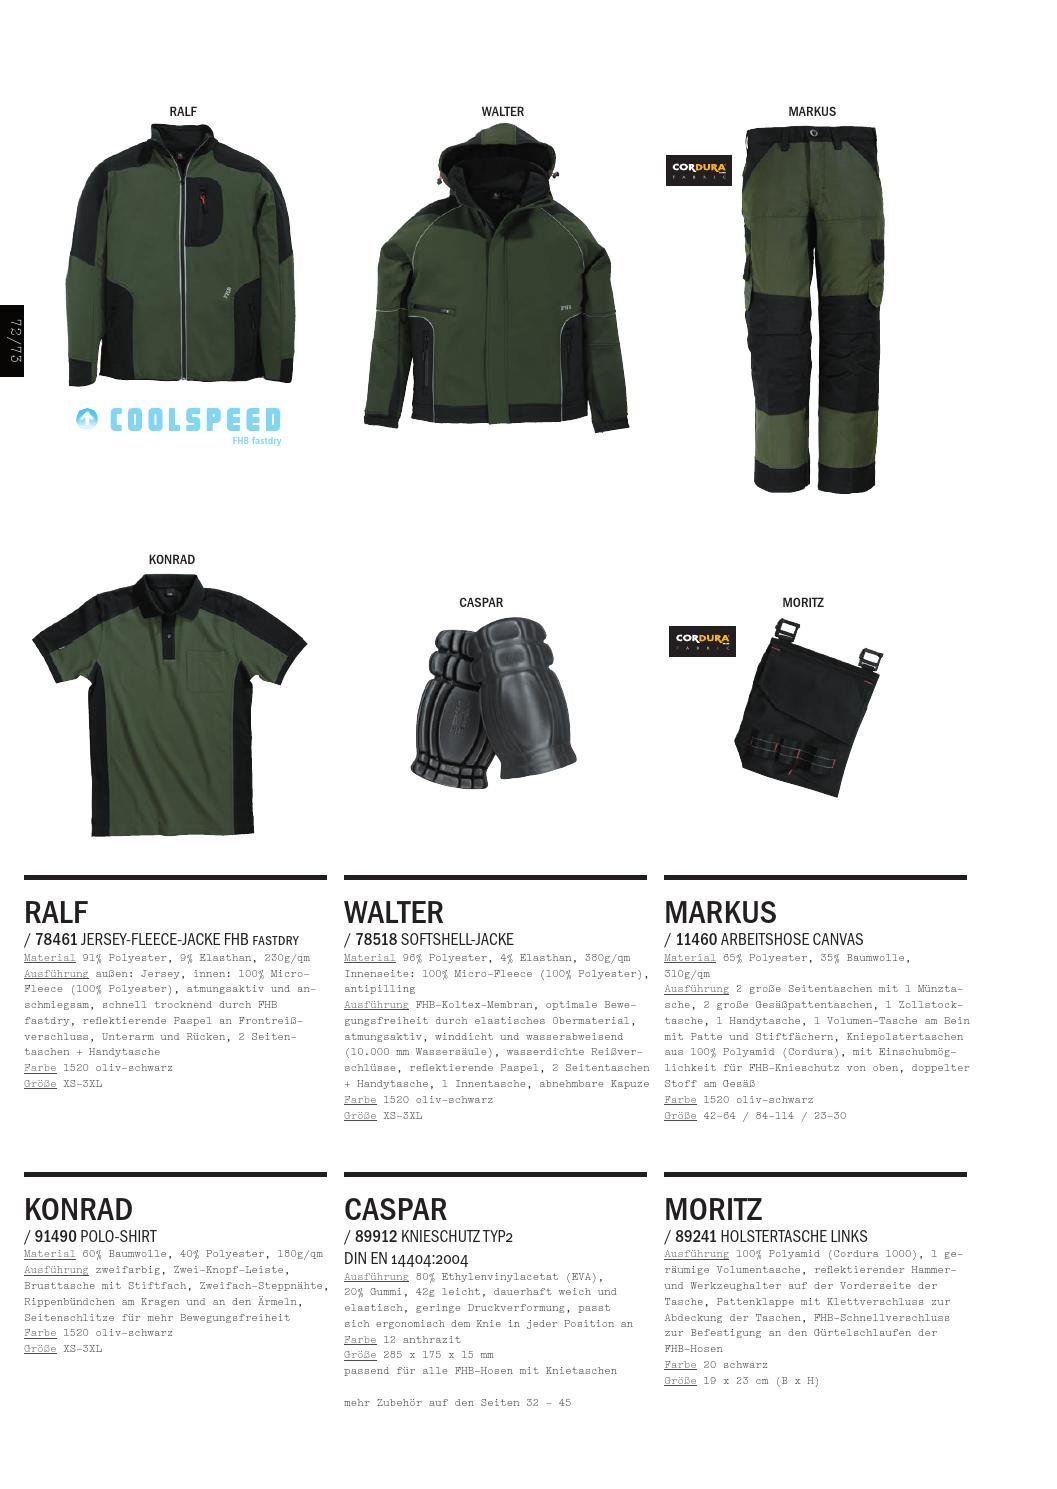 78518 Winddicht Alle Farben FHB WALTER Softshell-Jacke mit FHB-MEMBRAN